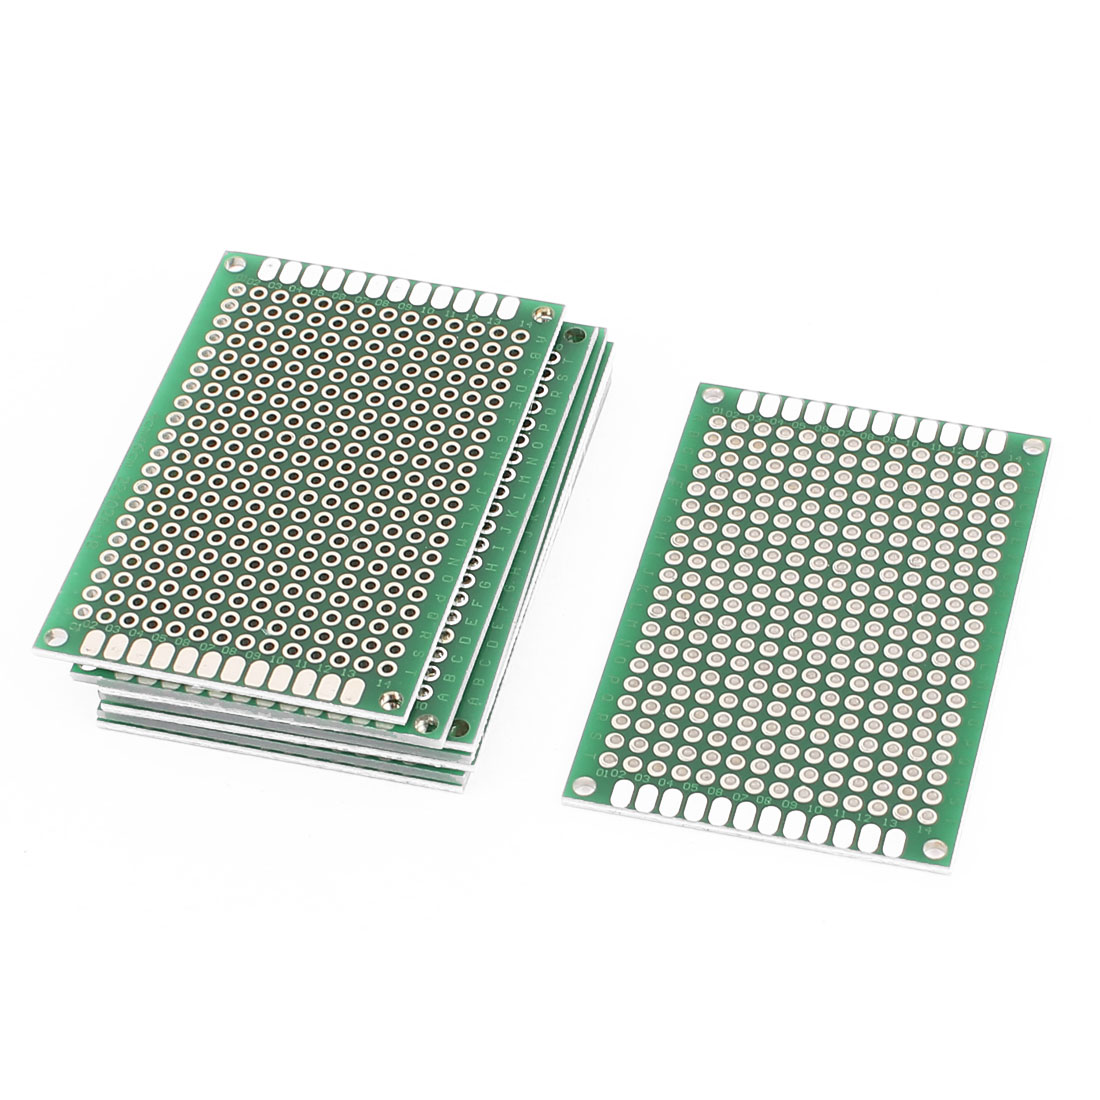 8Pcs Double-Side Prototype Solderable Paper Universal PCB Board 4x6cm